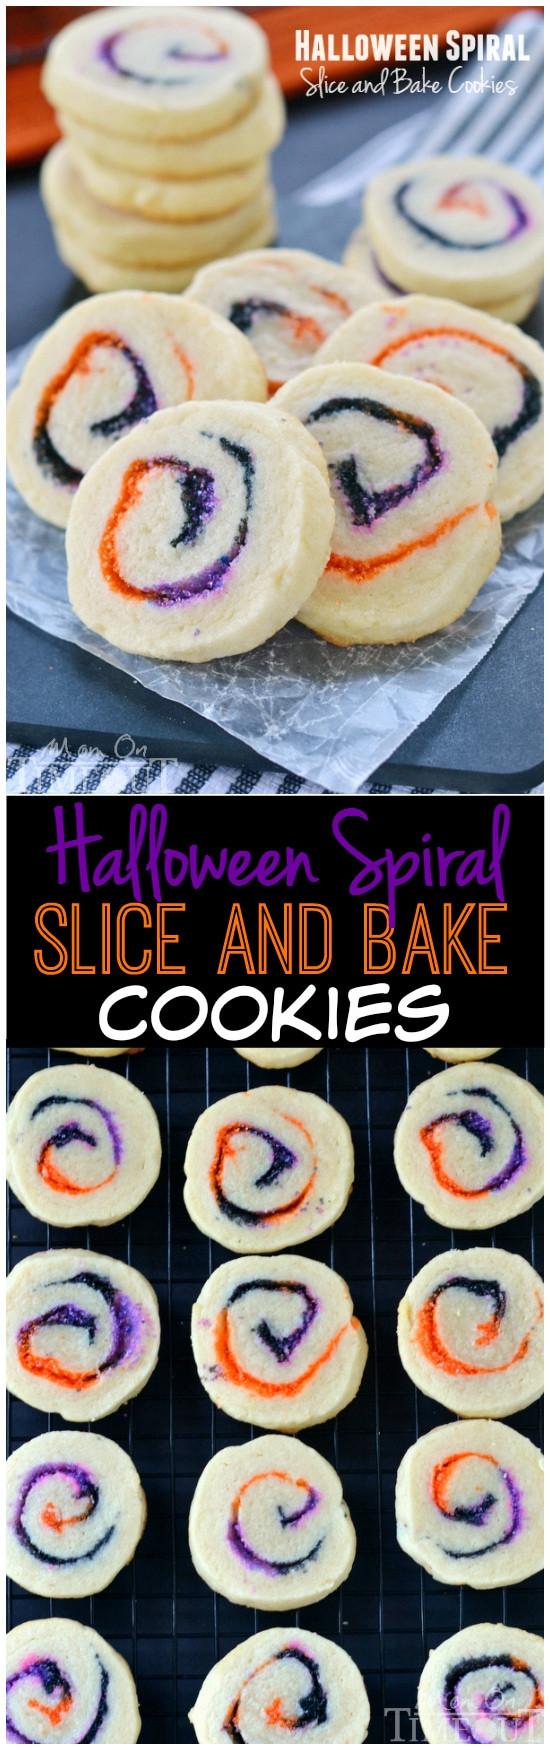 Slice And Bake Halloween Cookies  Halloween Spiral Slice and Bake Cookies Mom Timeout